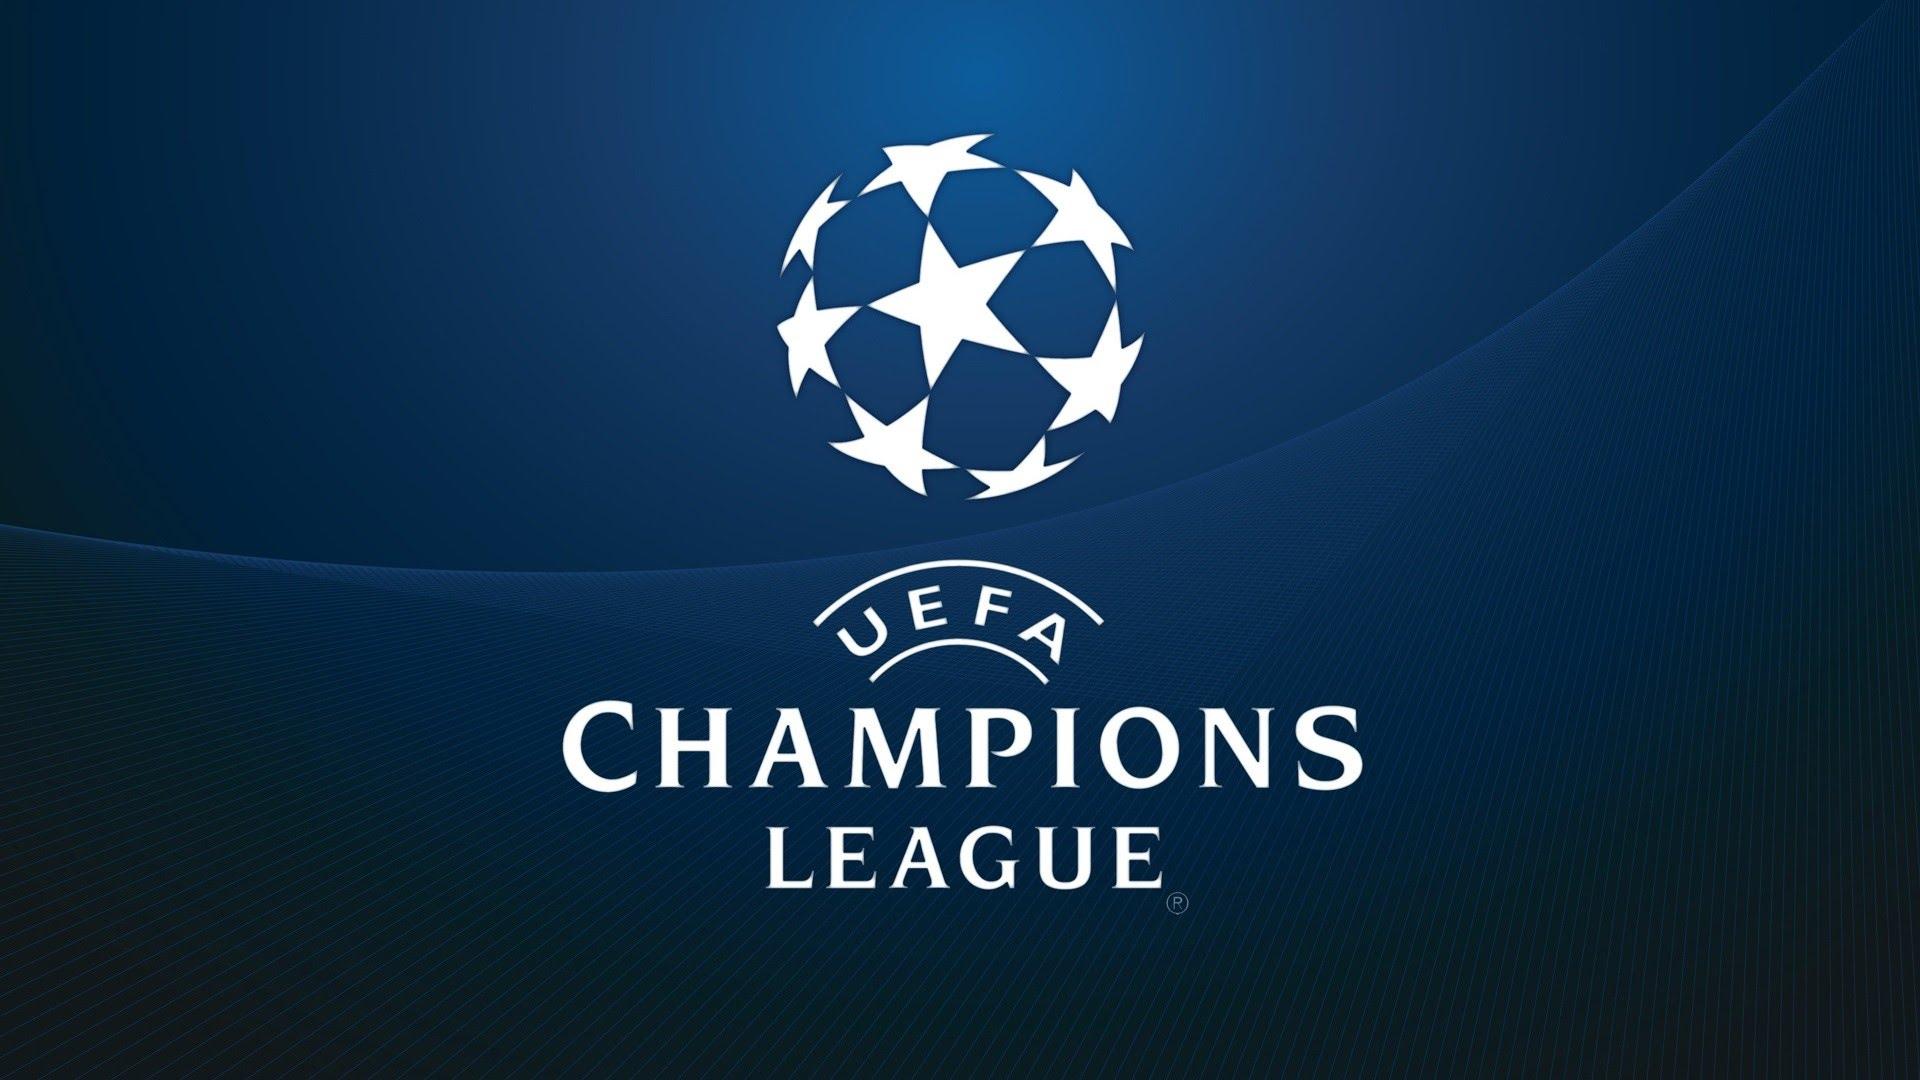 Jadwal Liga Champions: Jadwal Final Liga Champions 2015/2016